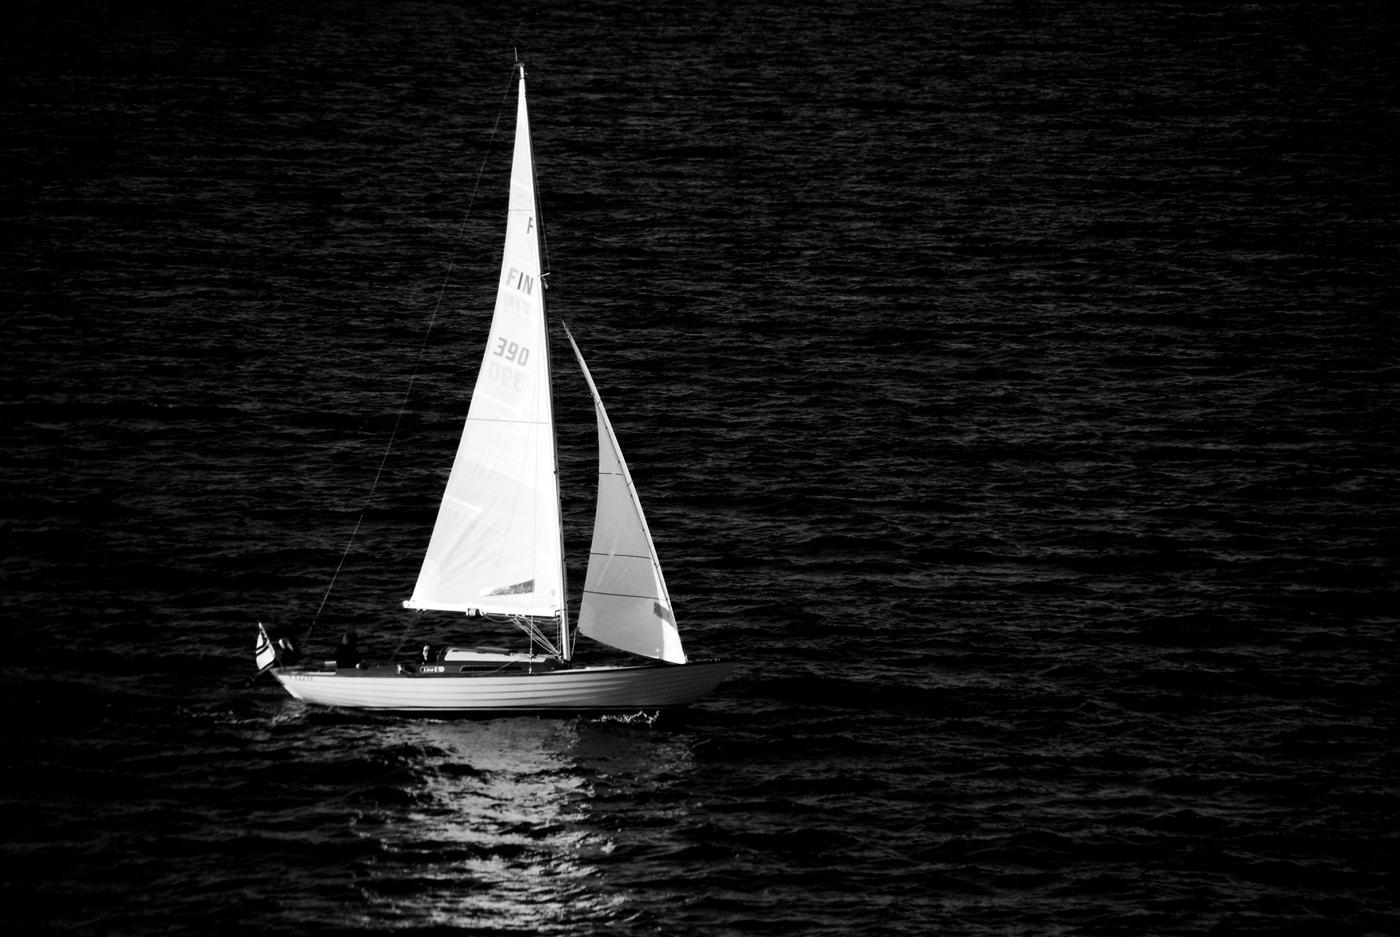 canoe53作品:帆